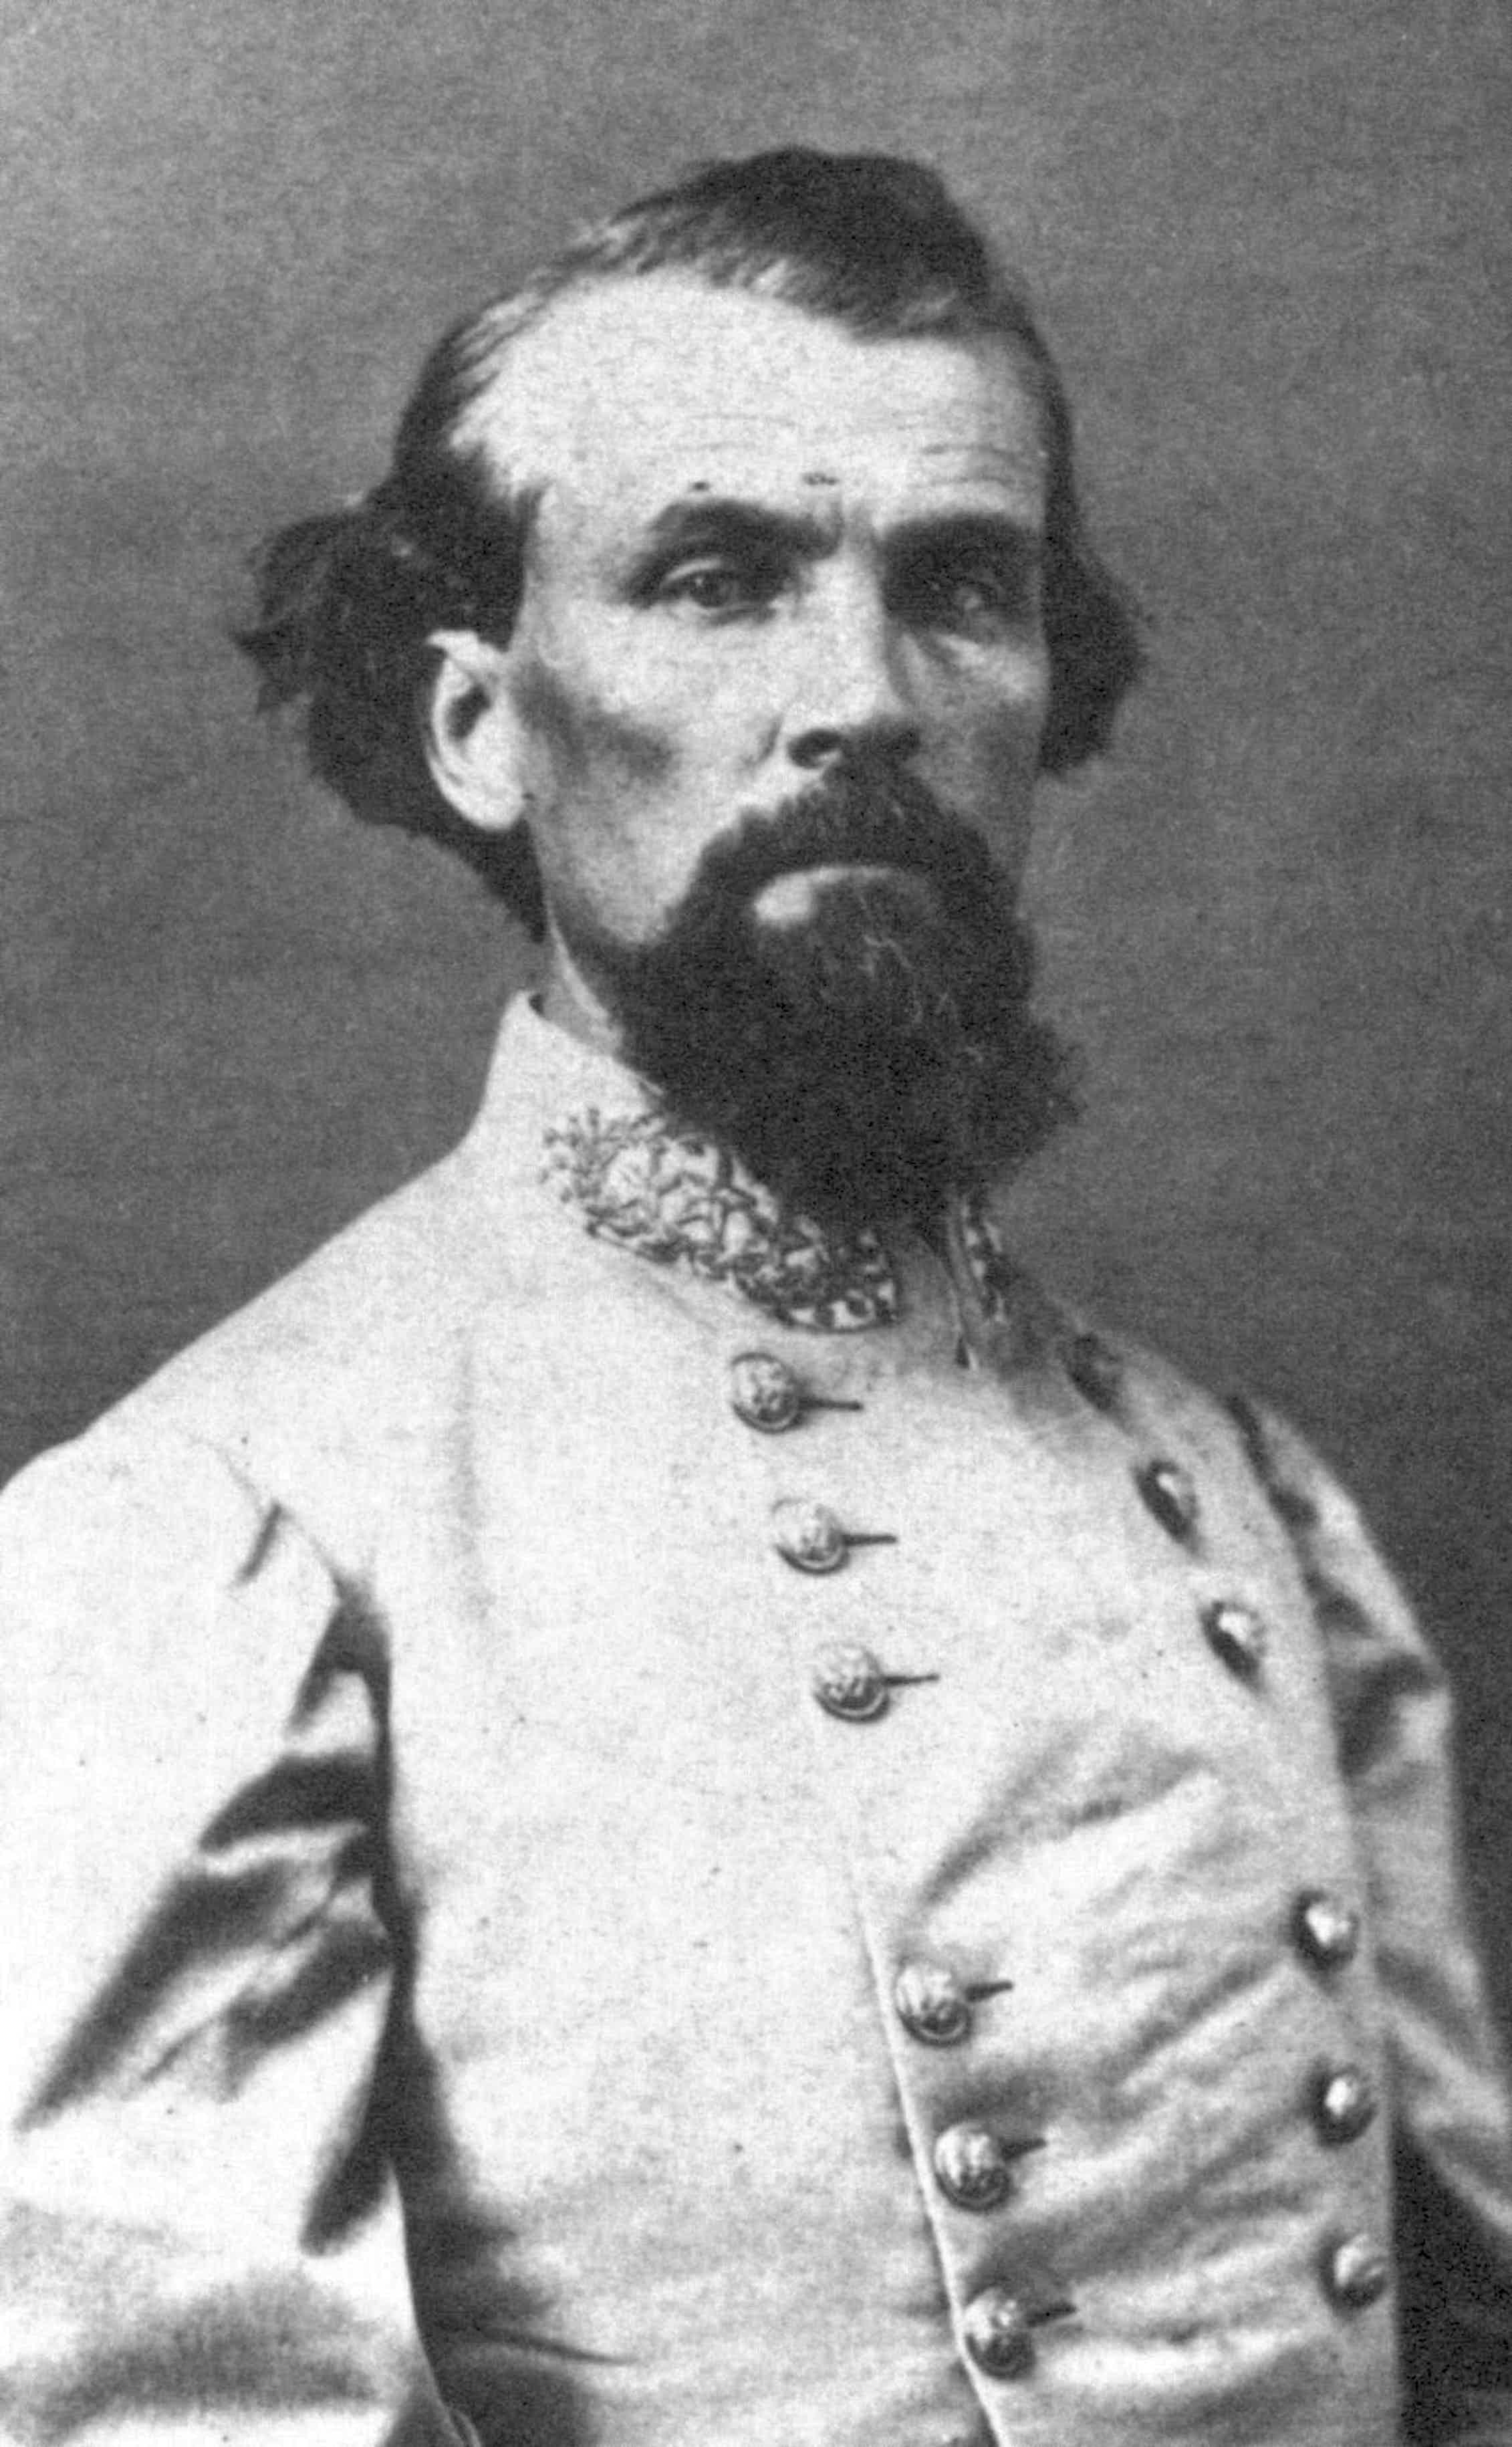 Nathan Bedford Forrest en 1964.Wikimedia Commons